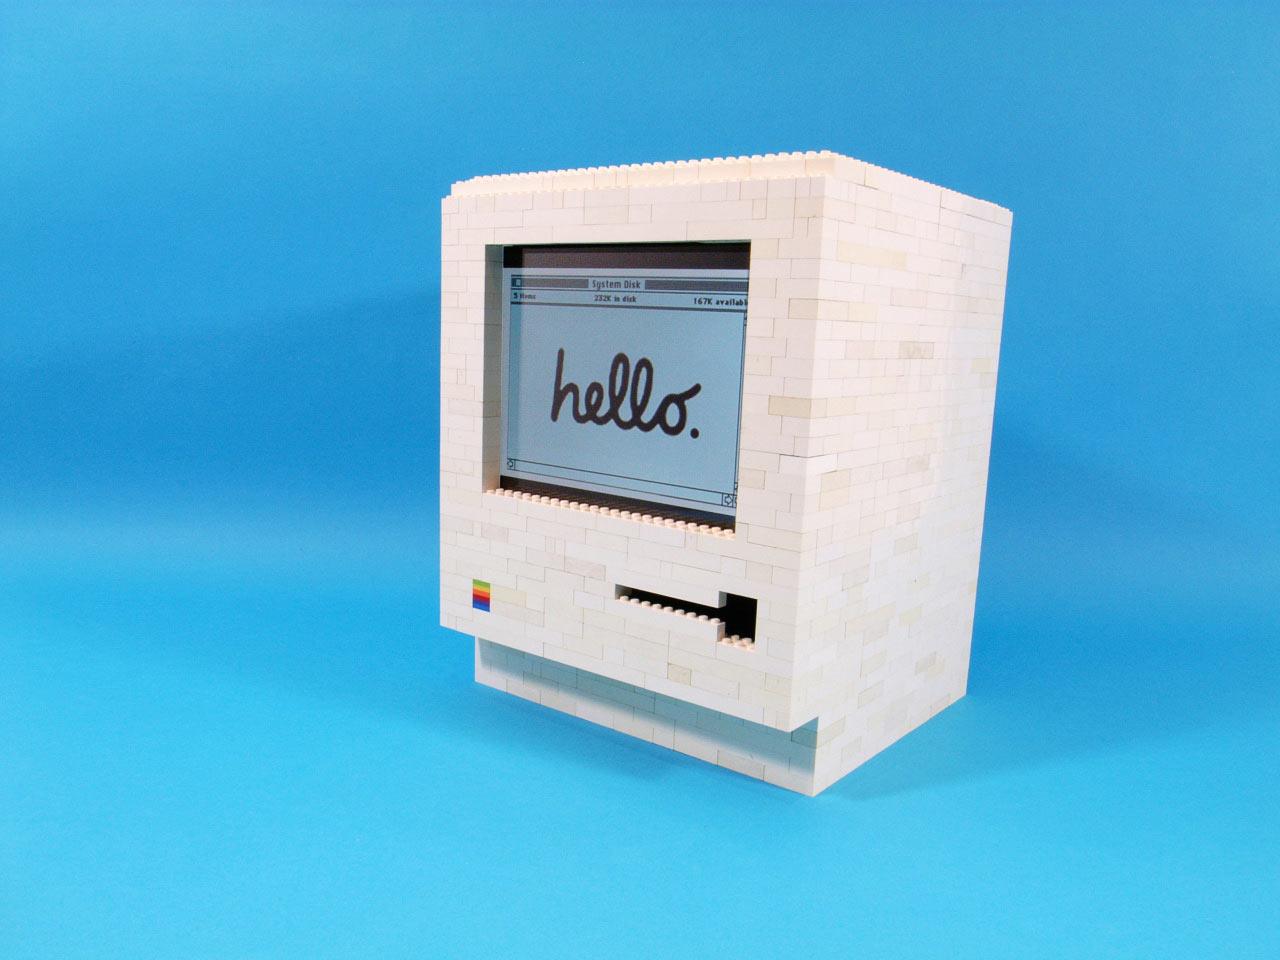 A LEGO 1984 Classic Macintosh Built for the iPad